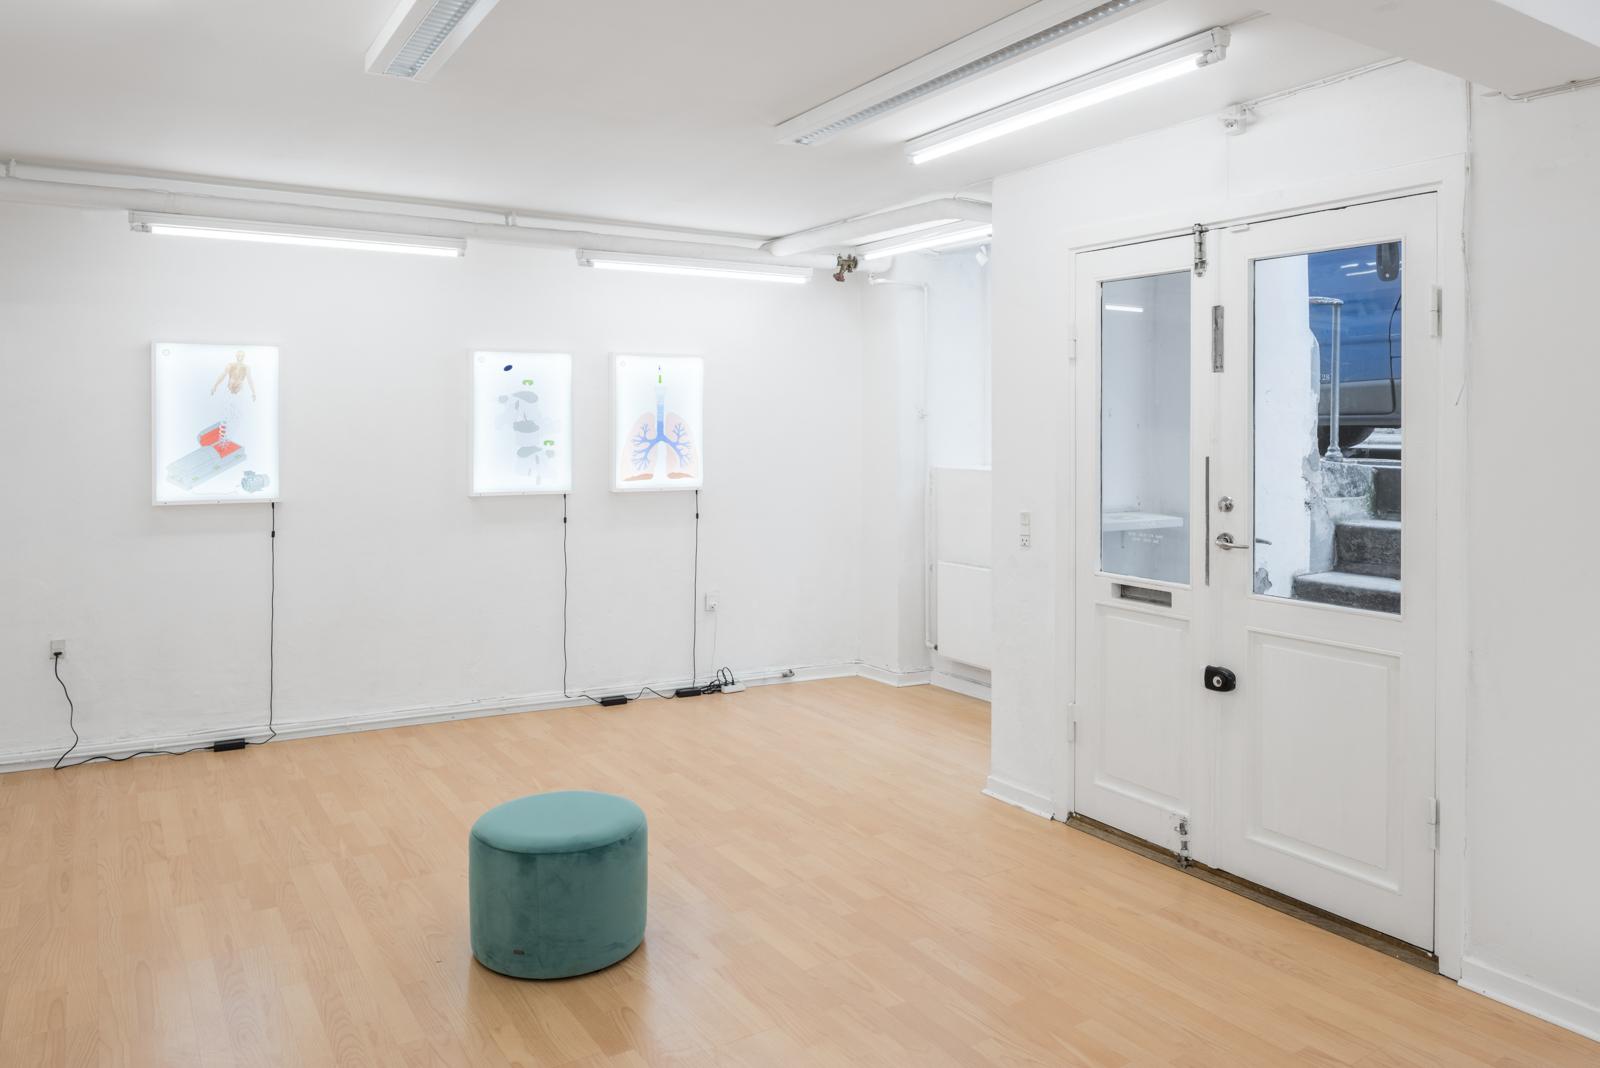 Installation view, 'Imagineering' by Piscine Think Tank | Photo: David Stjernholm.